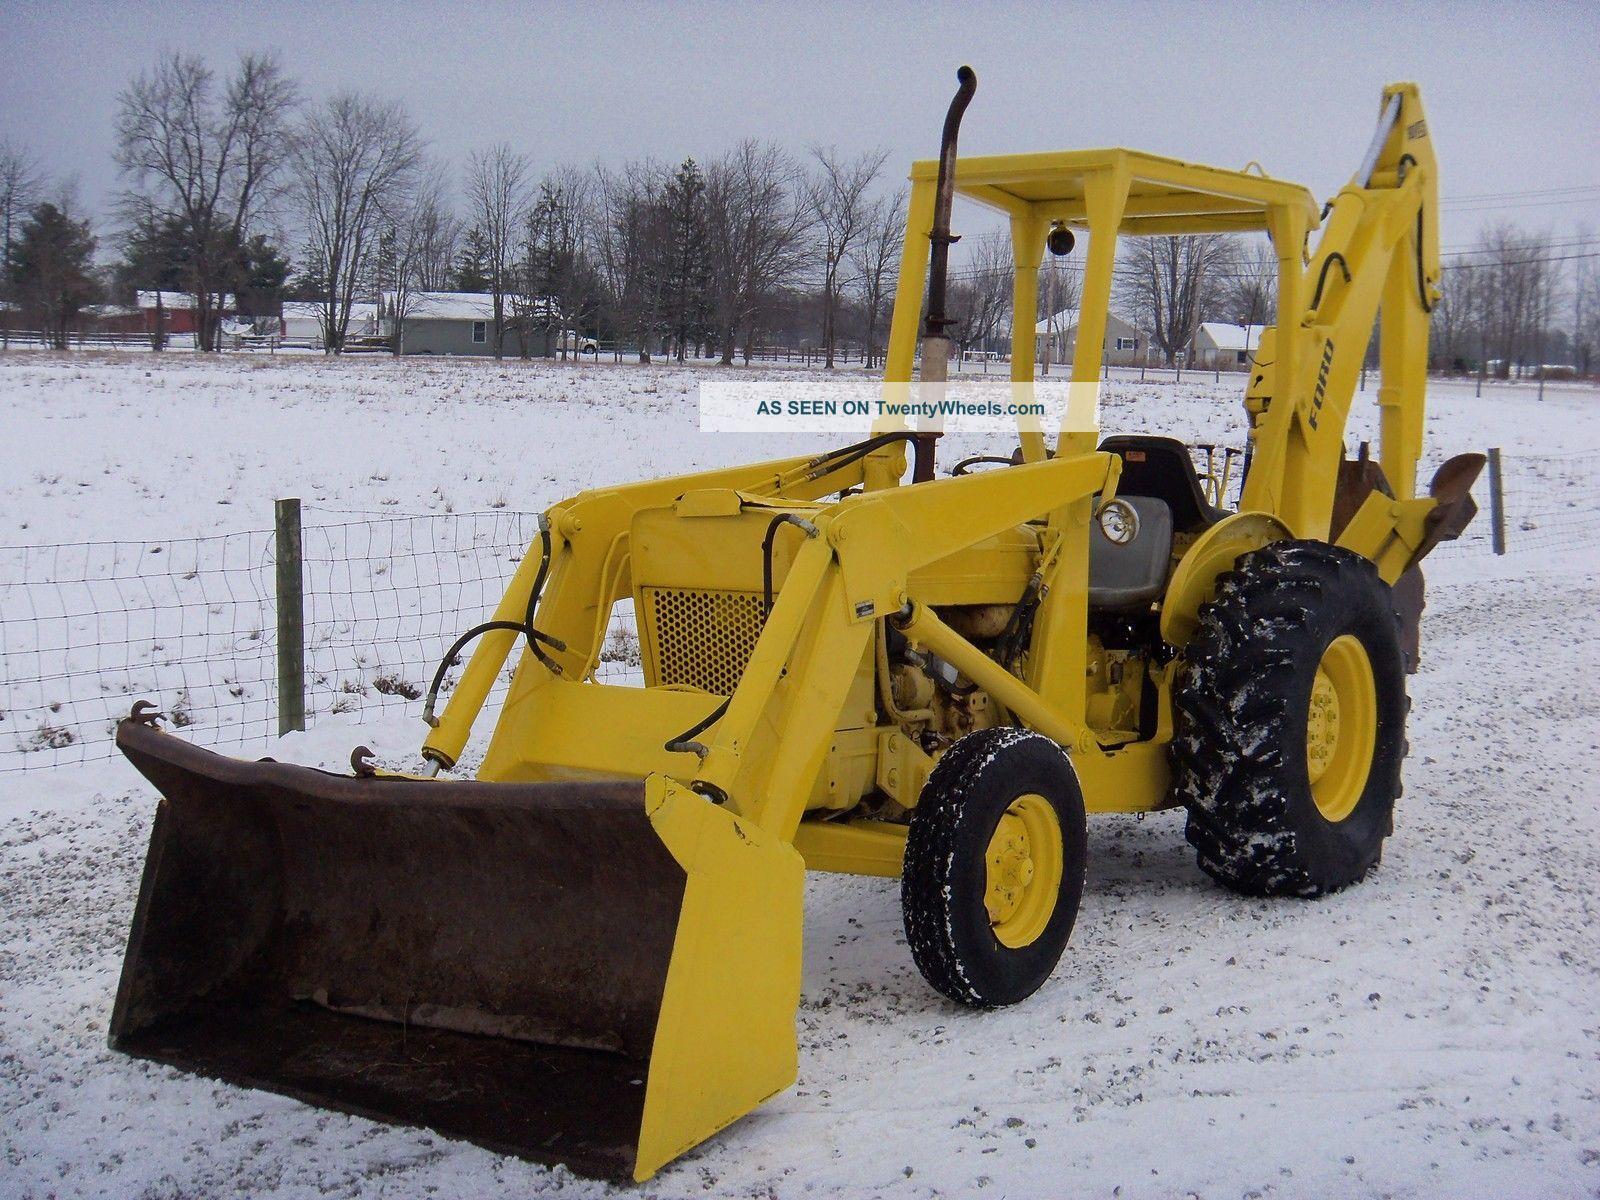 Ford 4500 Industrial Tractor Backhoe : Ford backhoe diesel